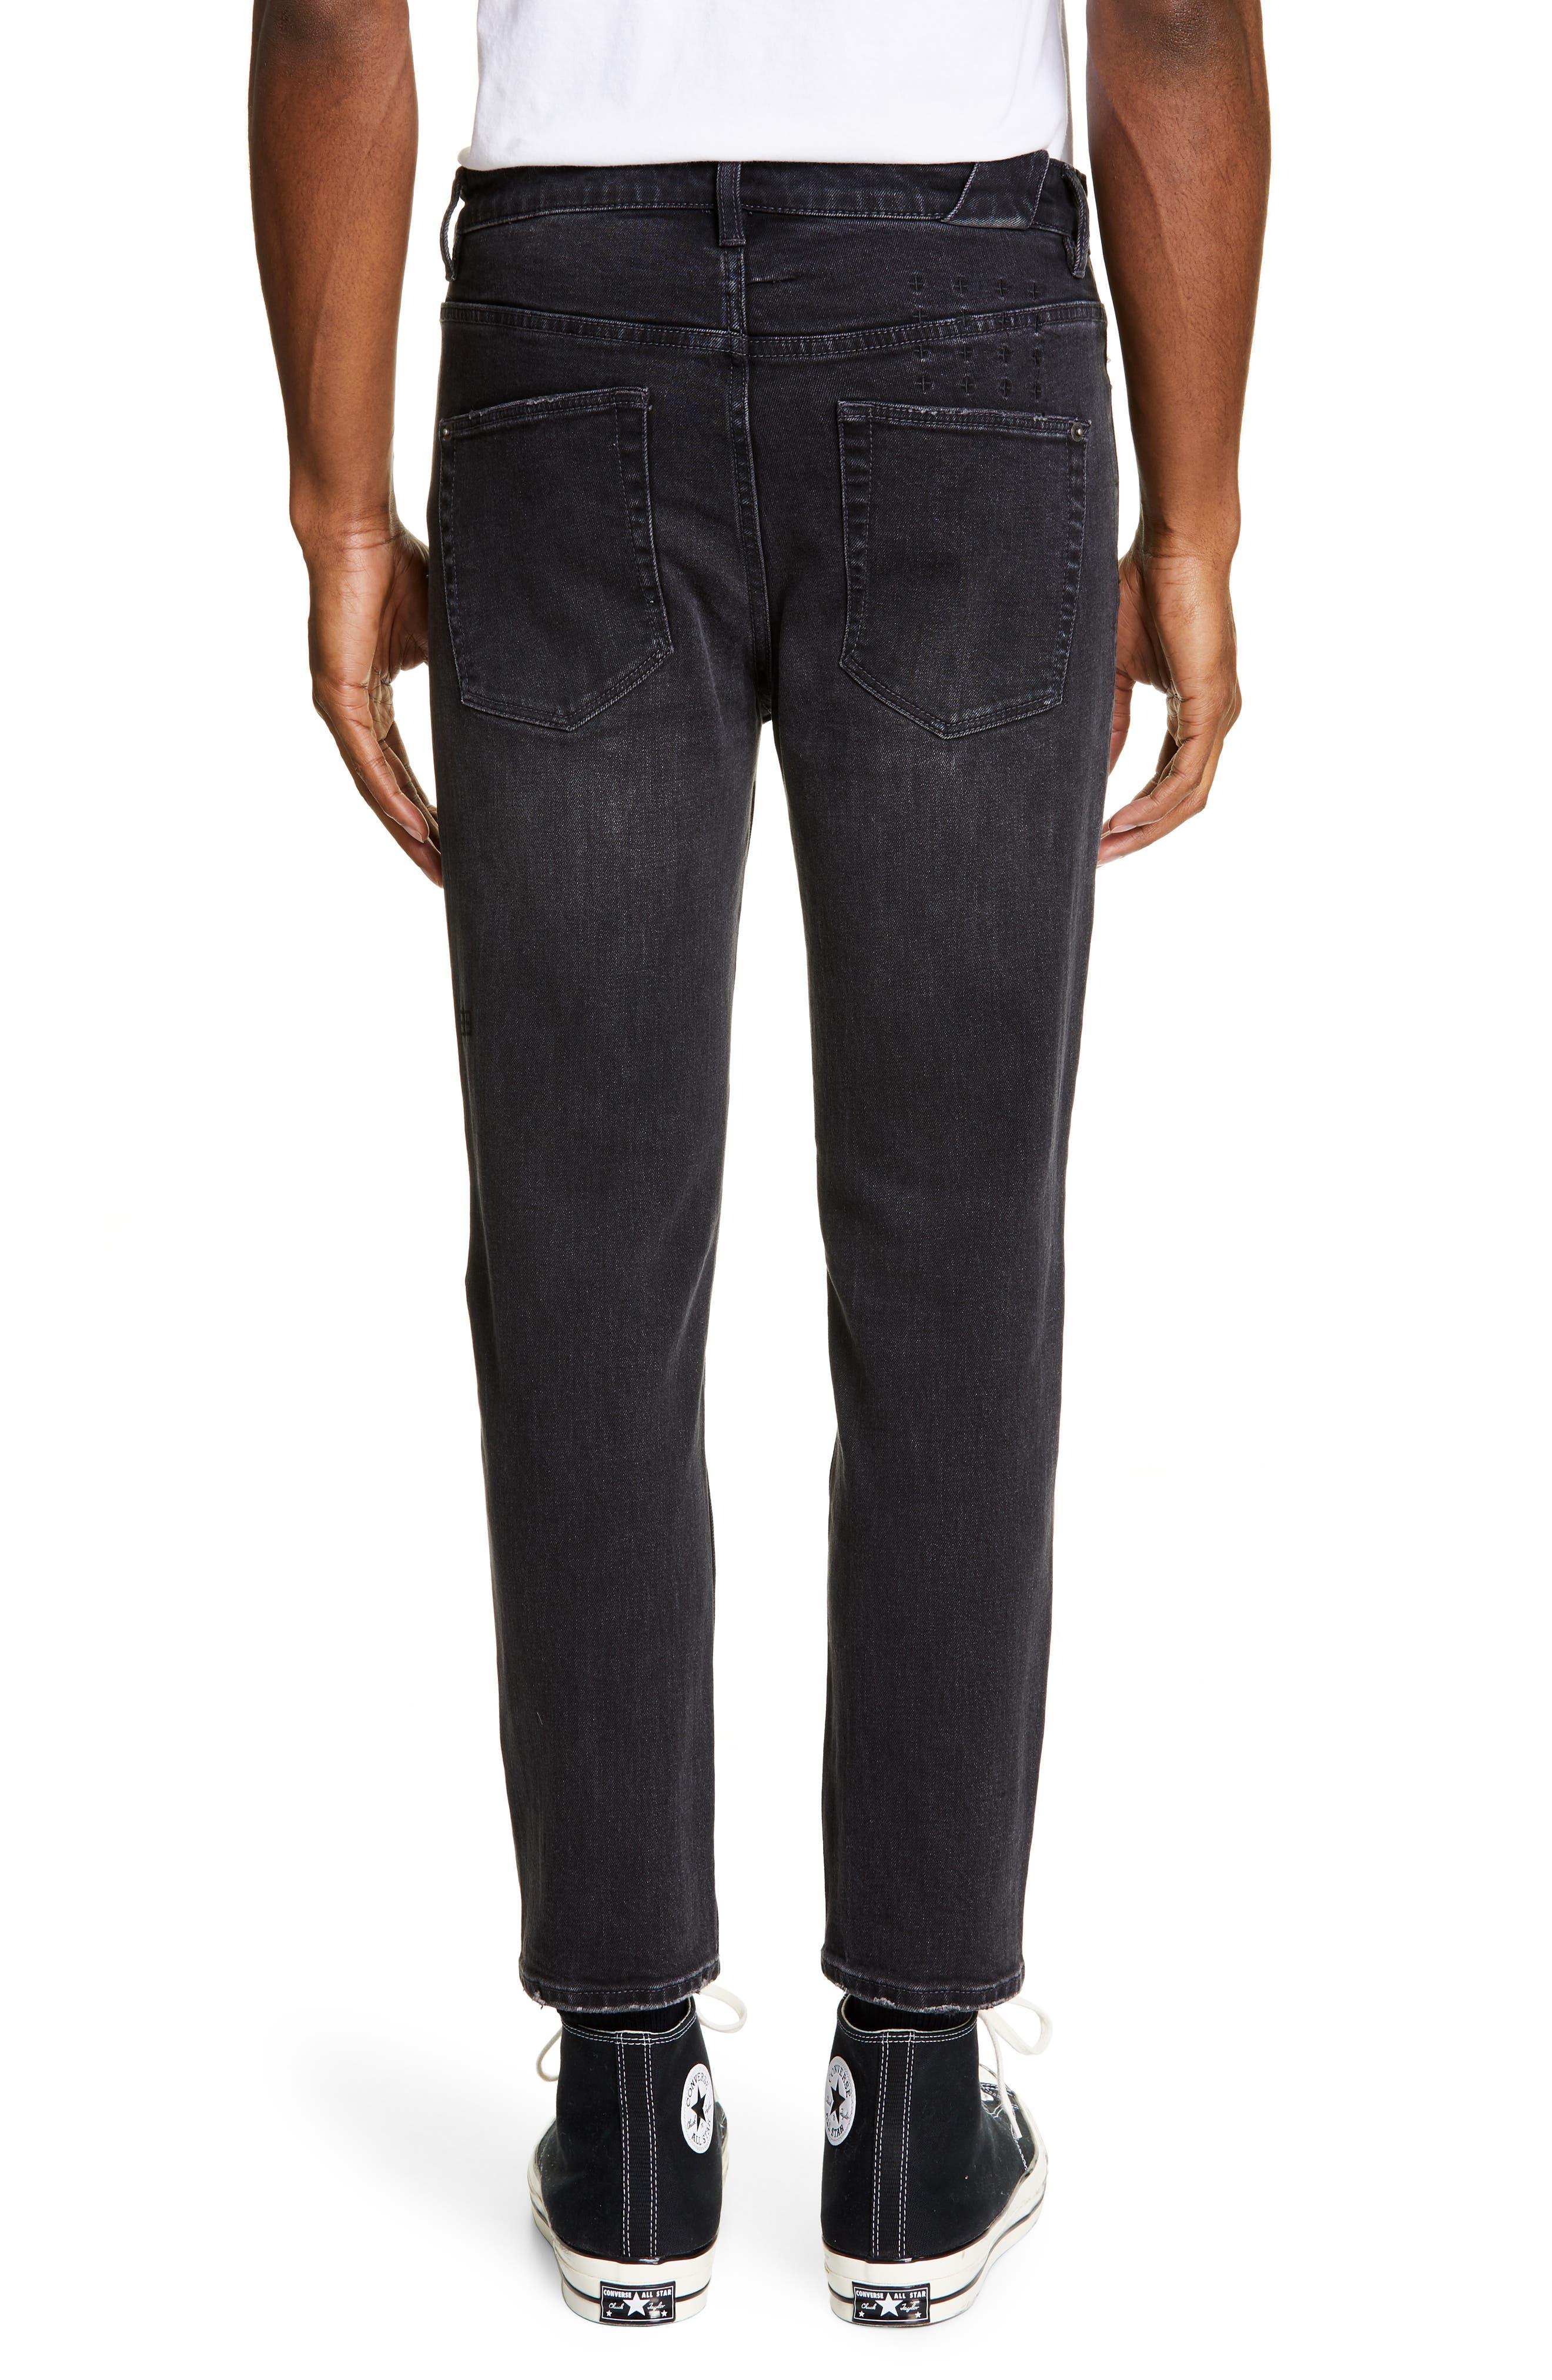 KSUBI, Chitch Hard Rock Skinny Fit Crop Jeans, Alternate thumbnail 2, color, BLACK